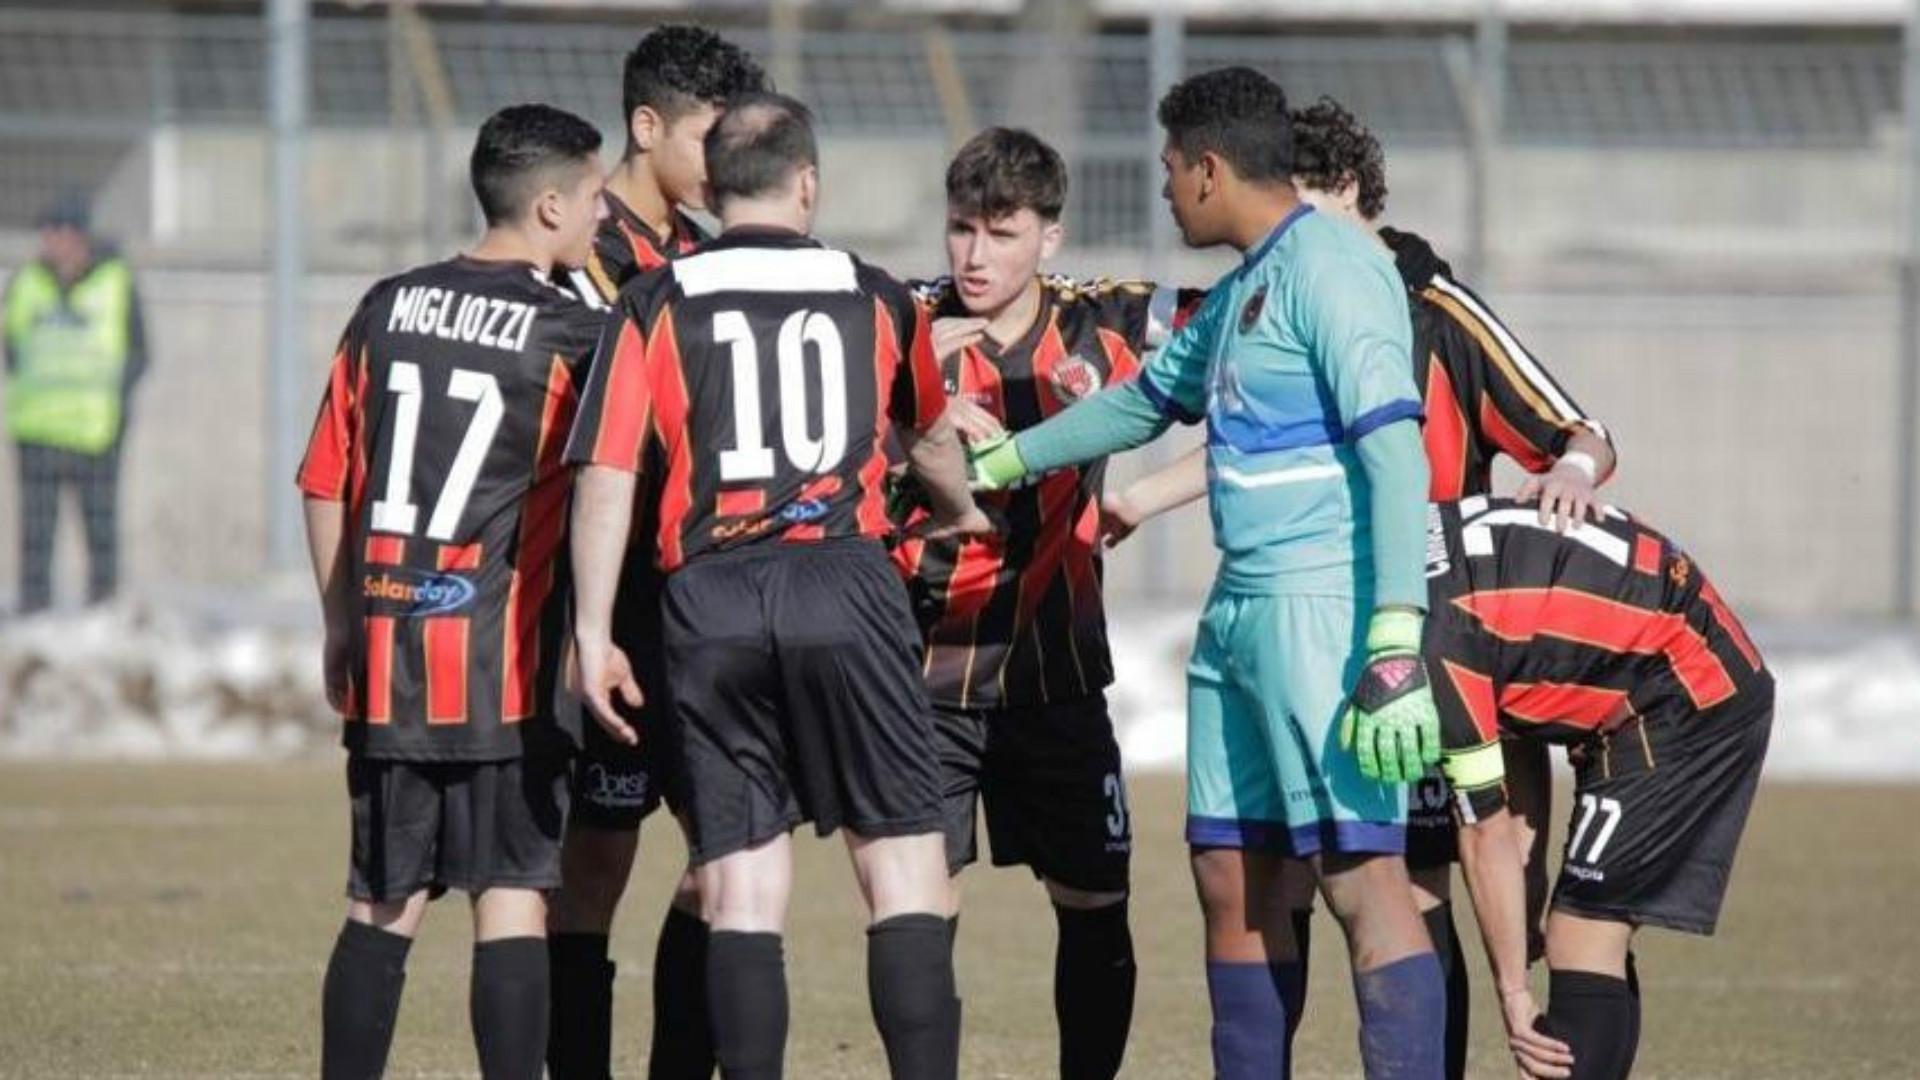 Italian minnows Pro Piacenza beaten 20-0 in league match